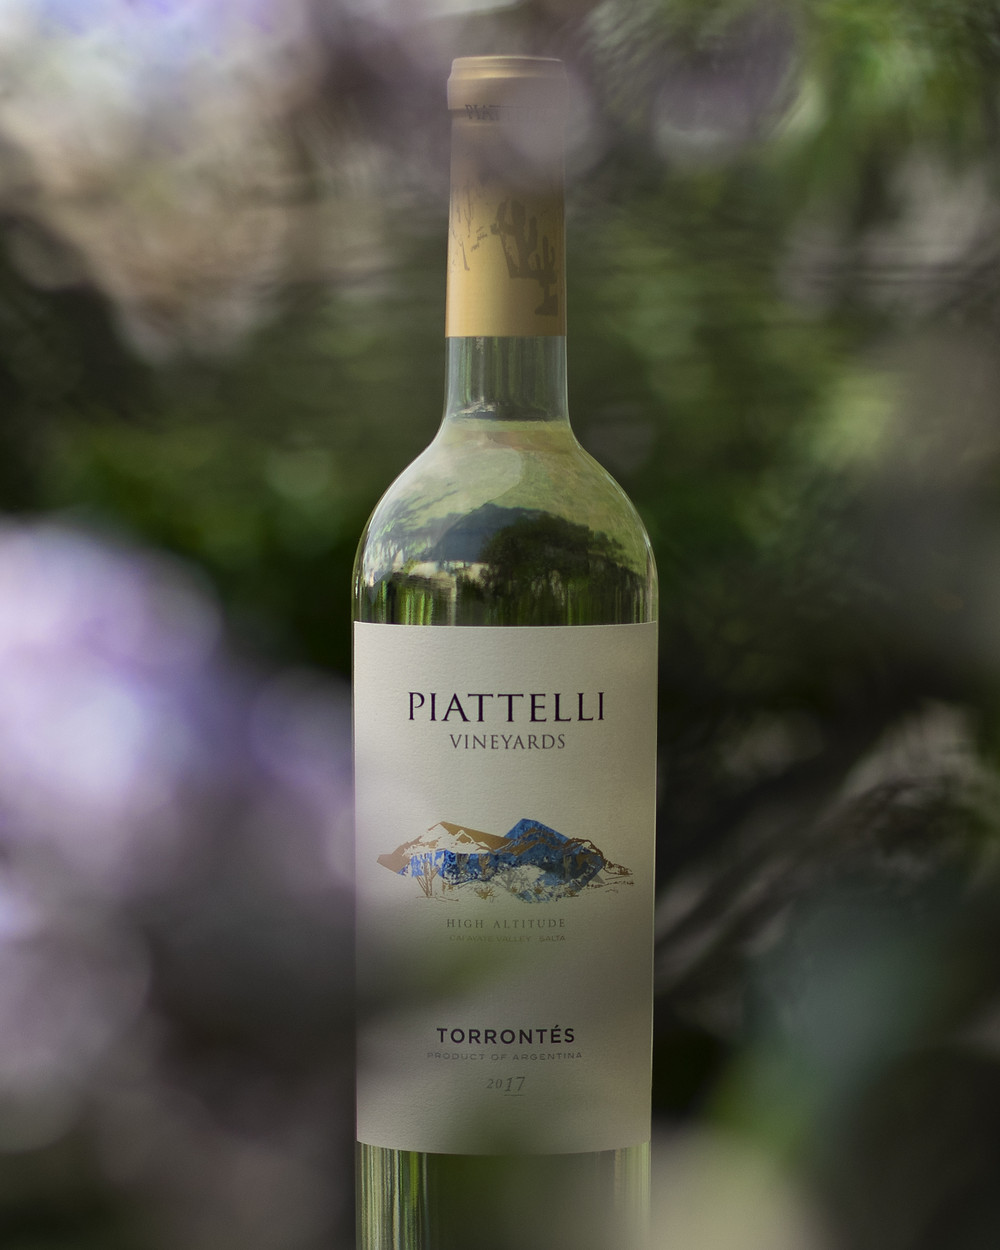 Piattelli Vineyards Torrontes